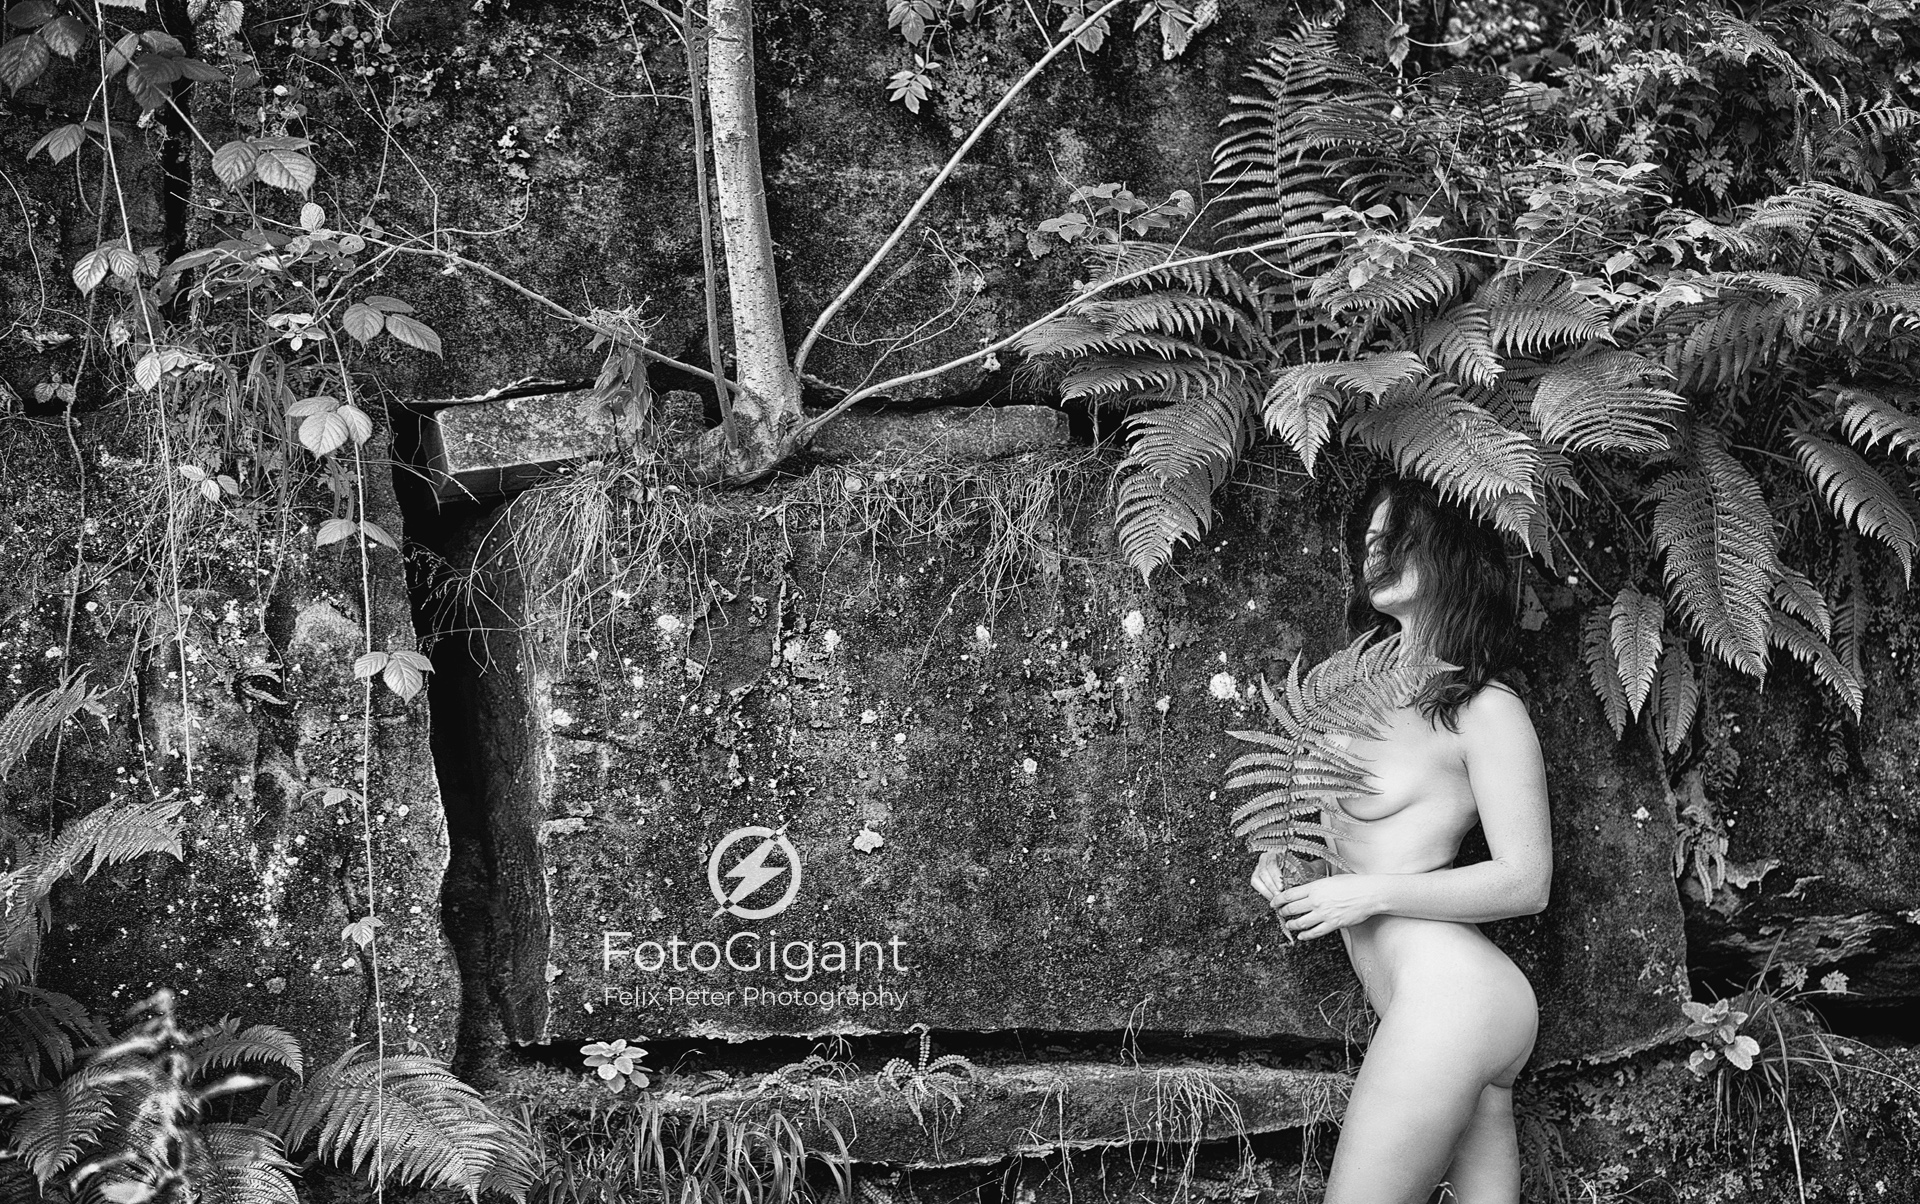 NudeArt_Outdoor_on-the-Rocks_05.jpg